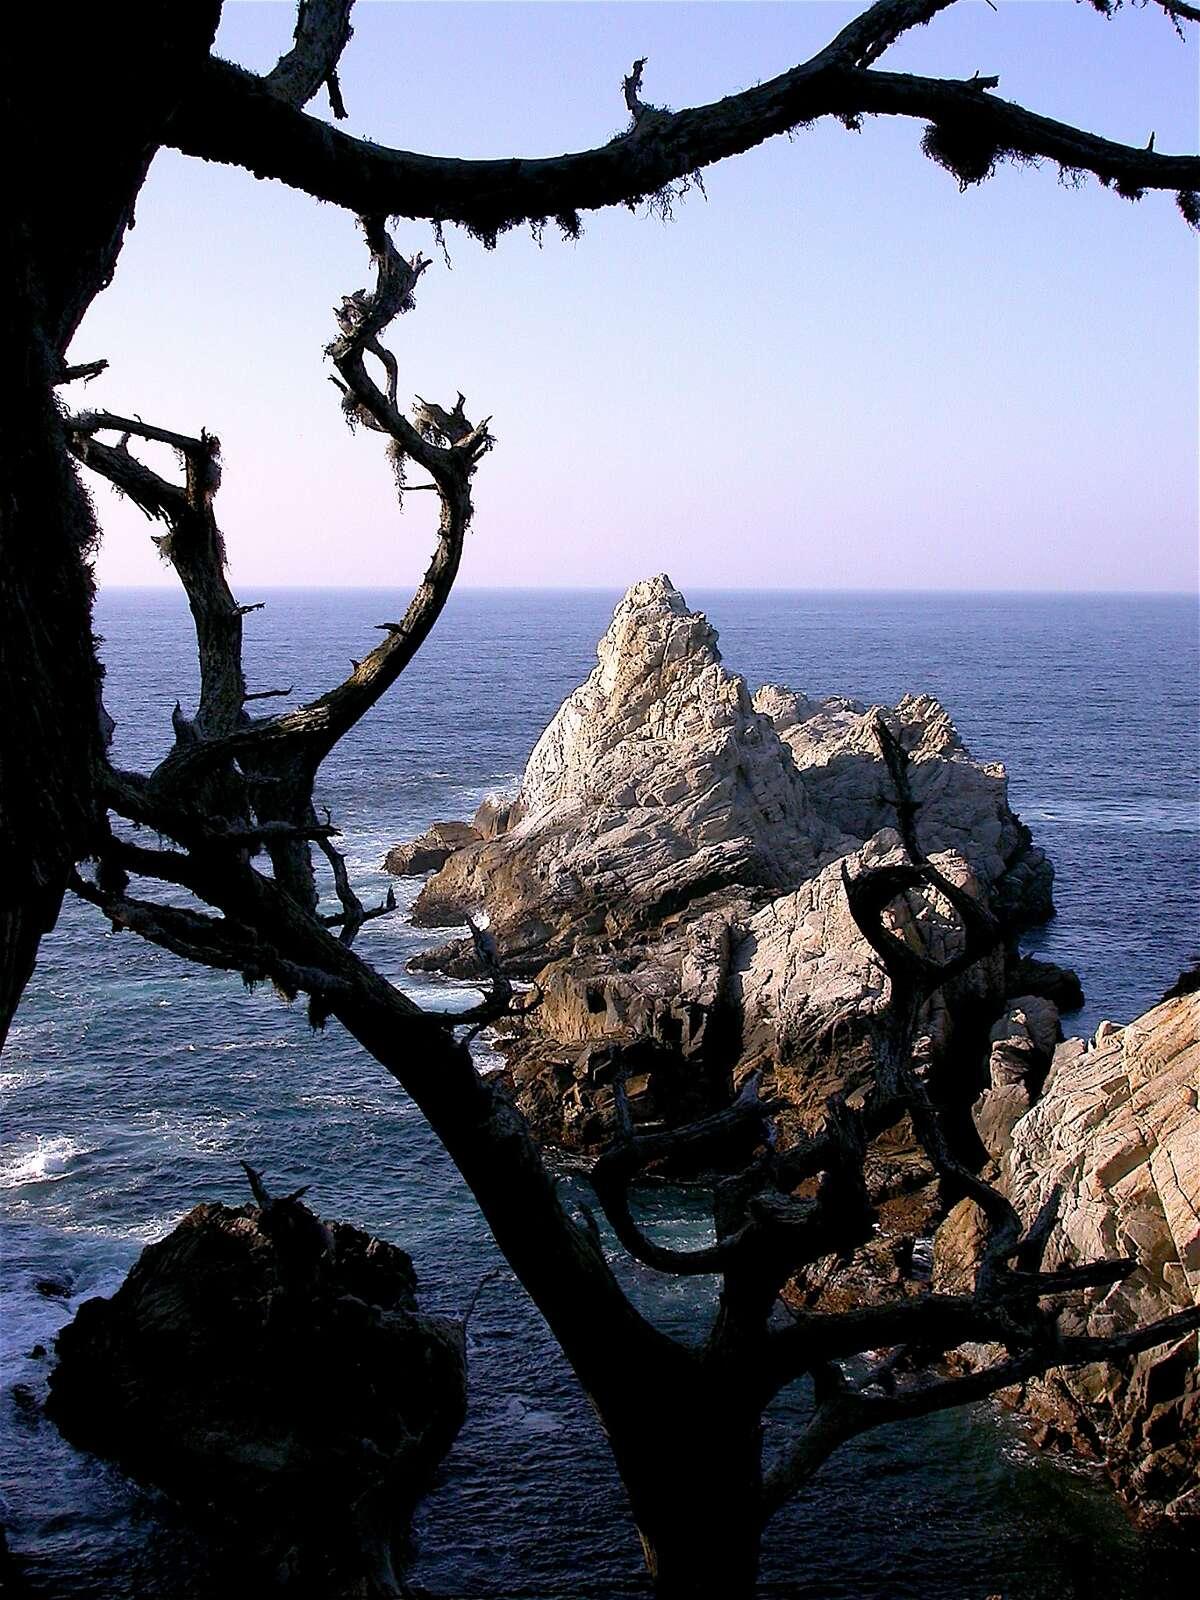 Pinnacle Point at Point Lobos State Natural Reserve at Carmel